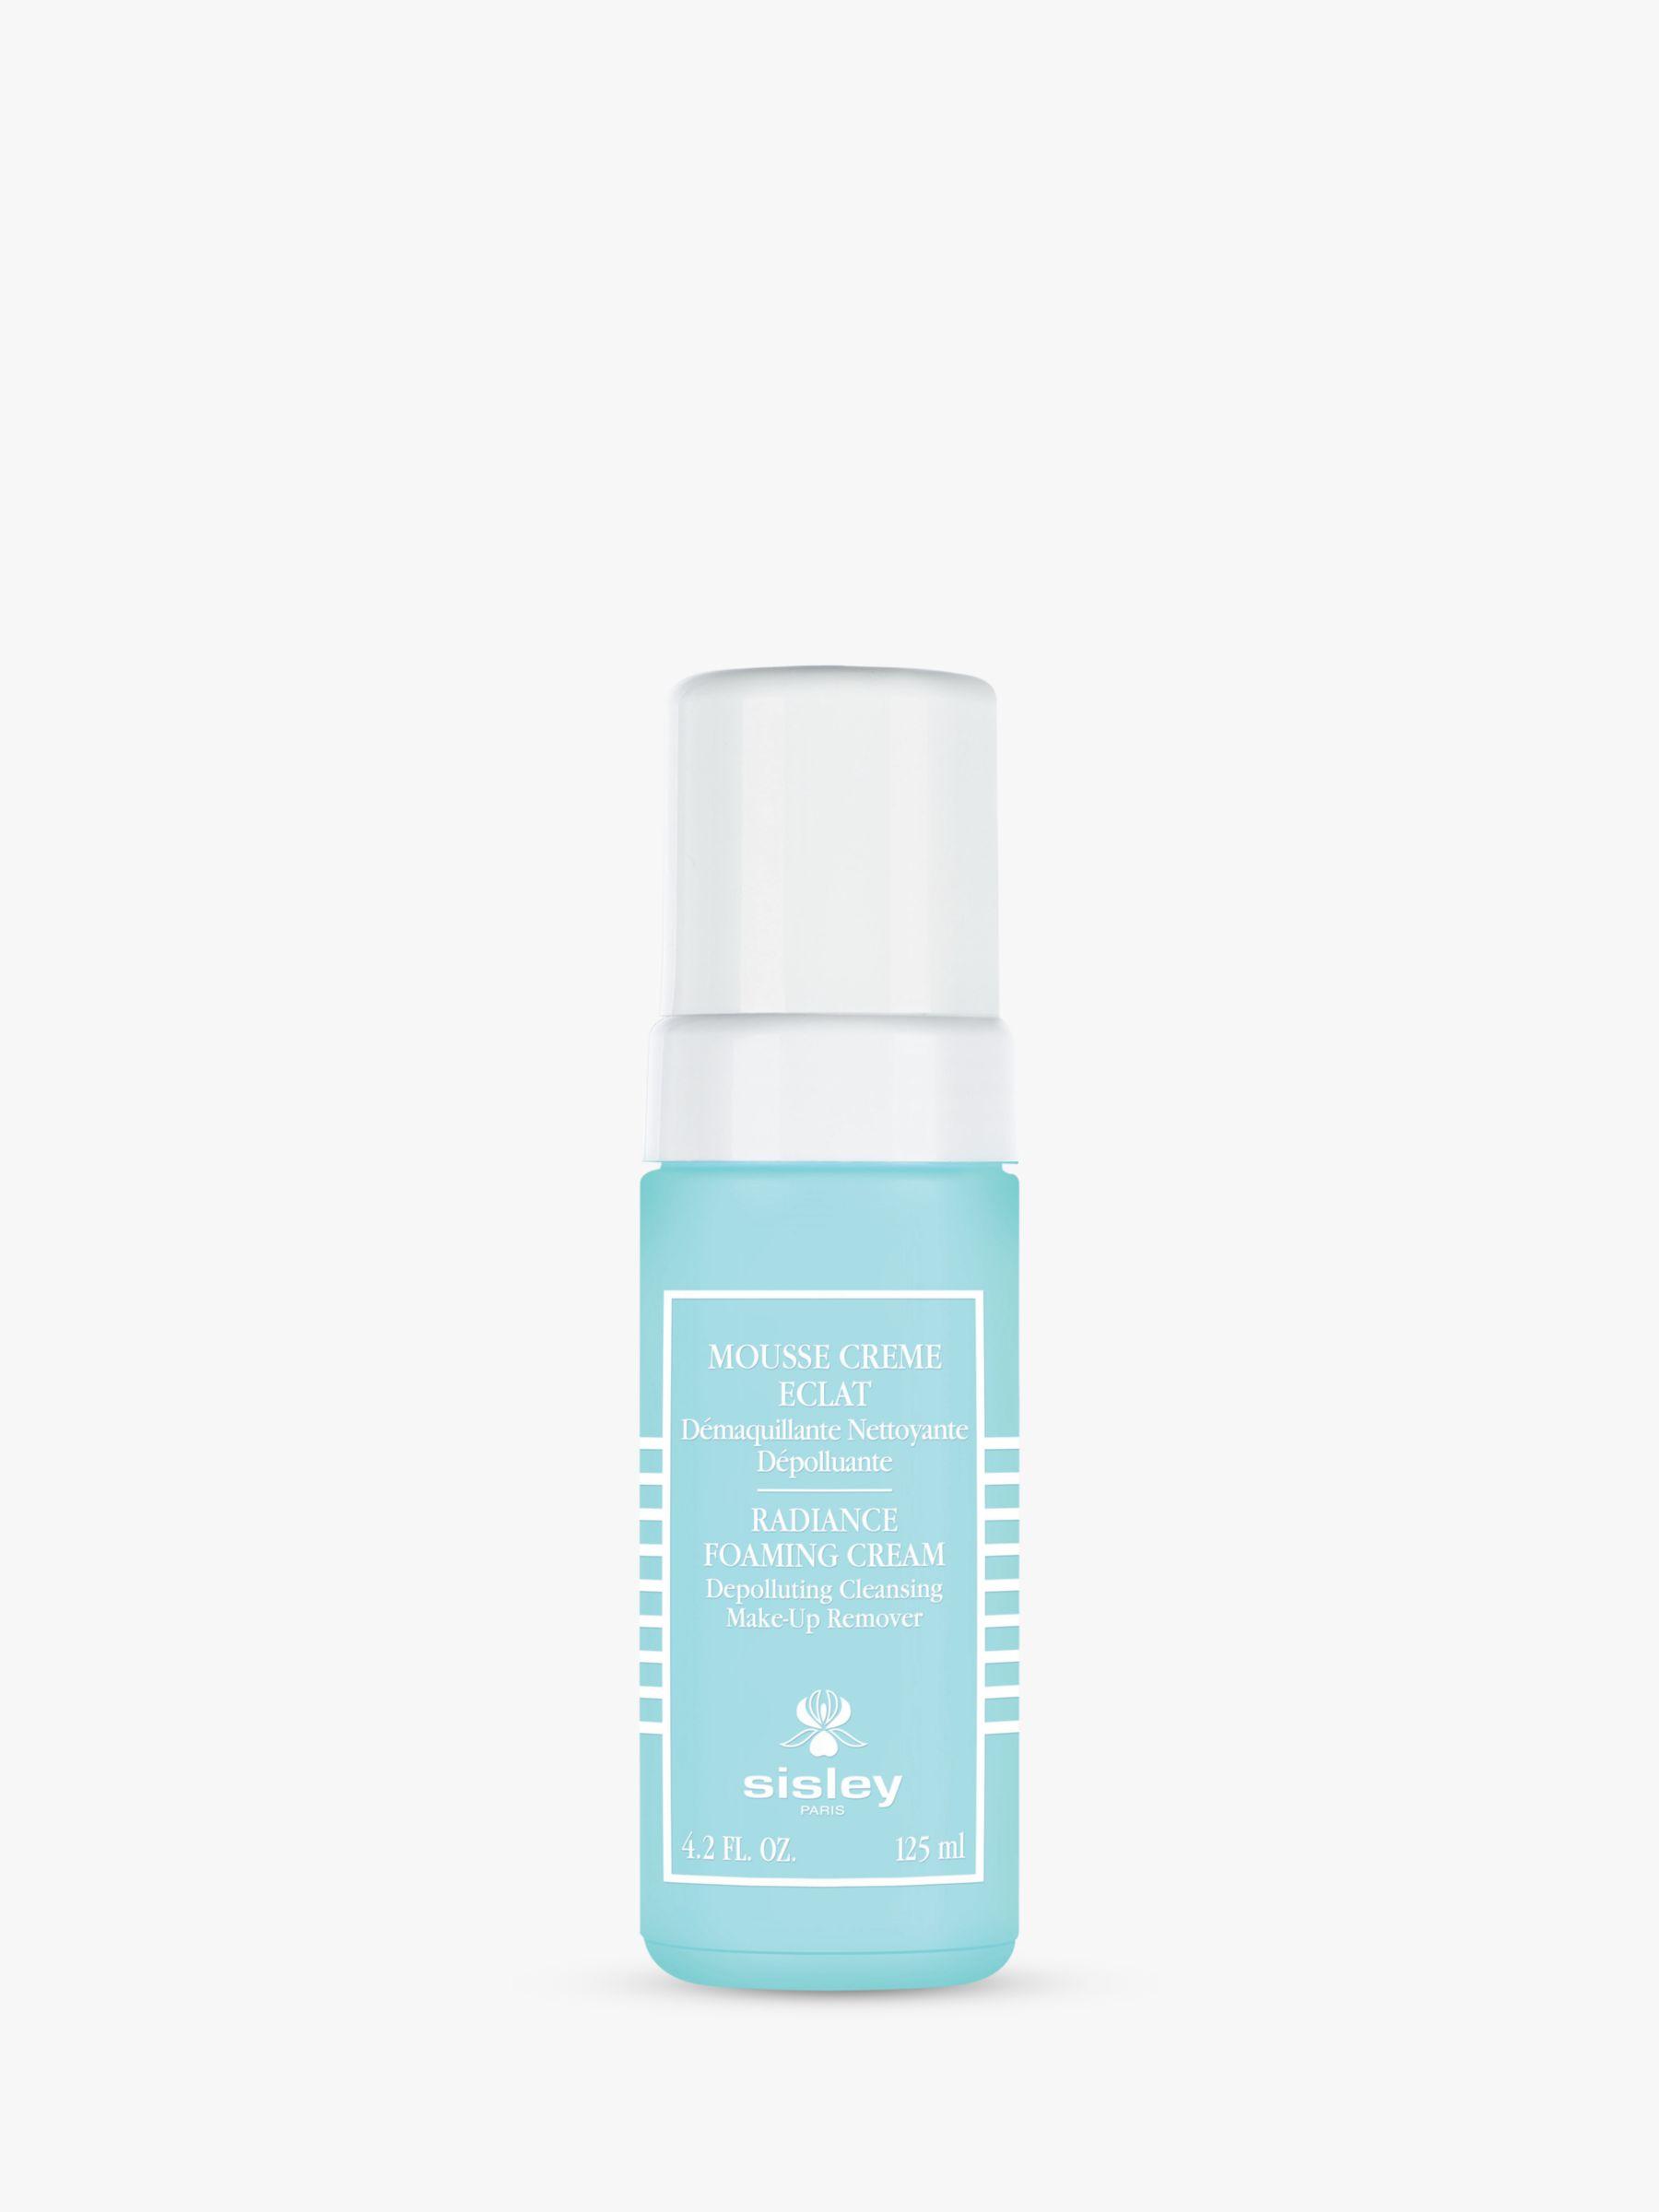 Sisley Sisley Radiance Foaming Cream Depolluting Cleansing Makeup Remover, 125ml